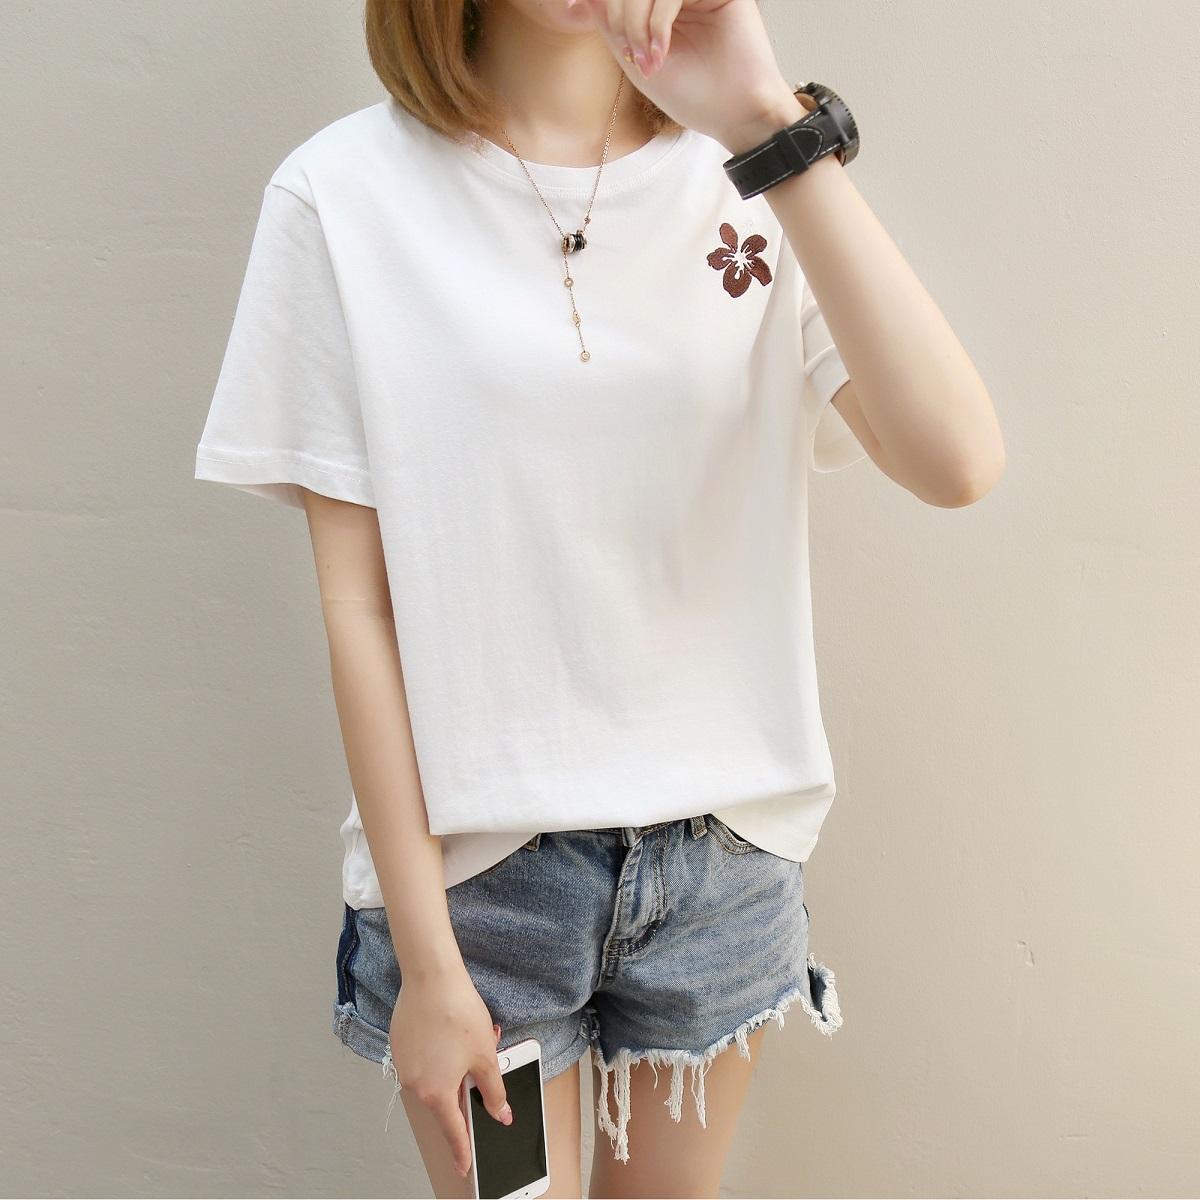 Review Pada Longgar Korea Wanita Kulit Putih Lengan Pendek T Shirt Sederhana T Shirt 274 Putih